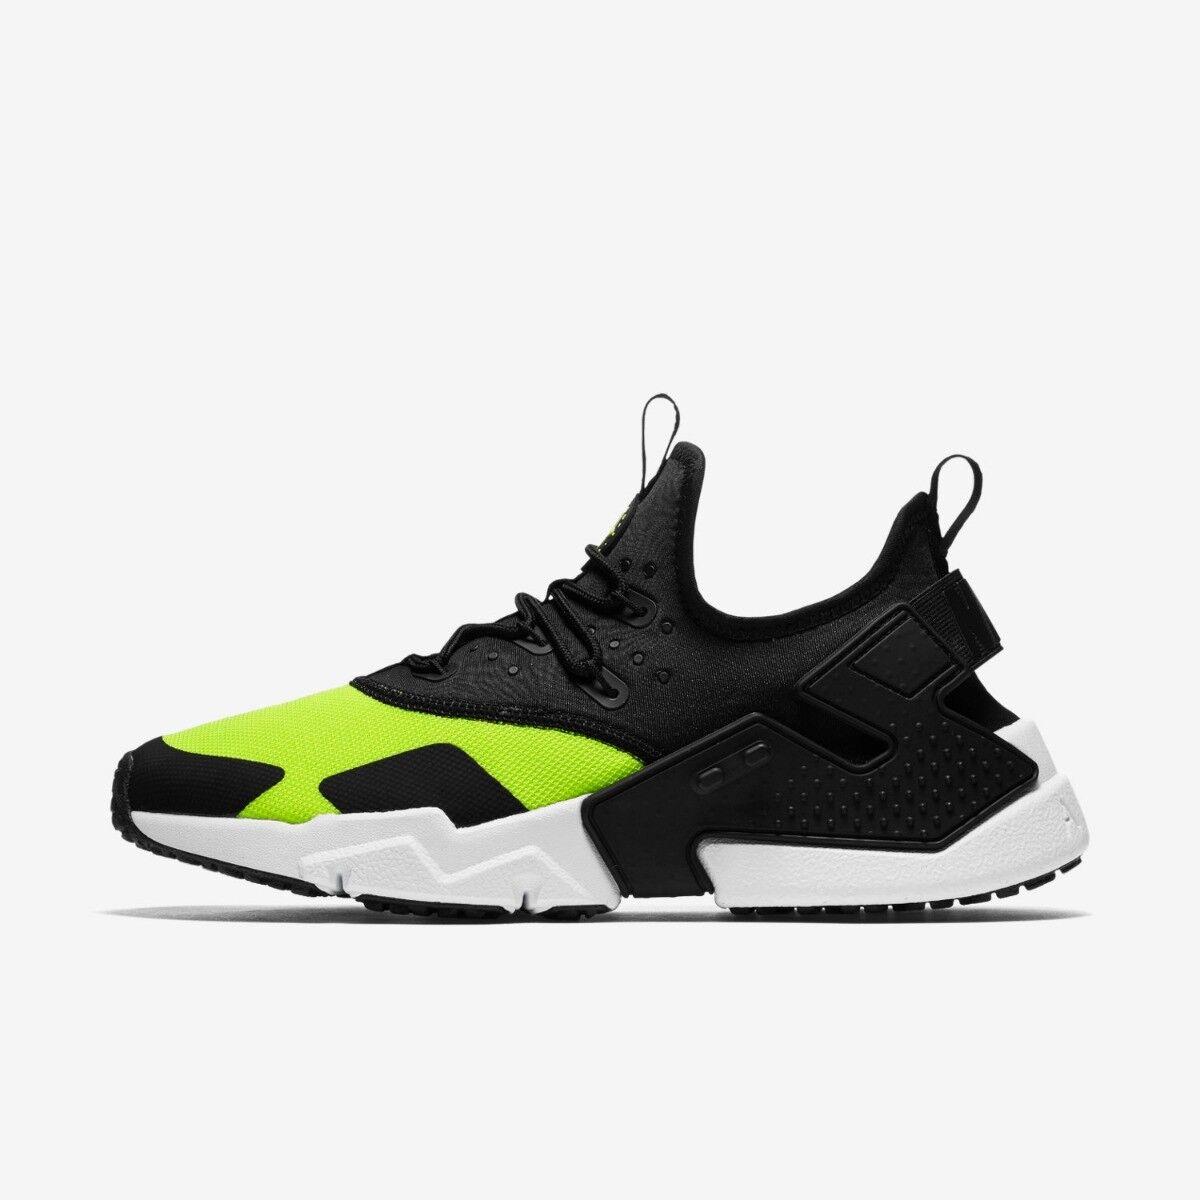 Nike Air Huarache Drift Mens Running Trainer shoes Size 7 - 10.5 RRP  -